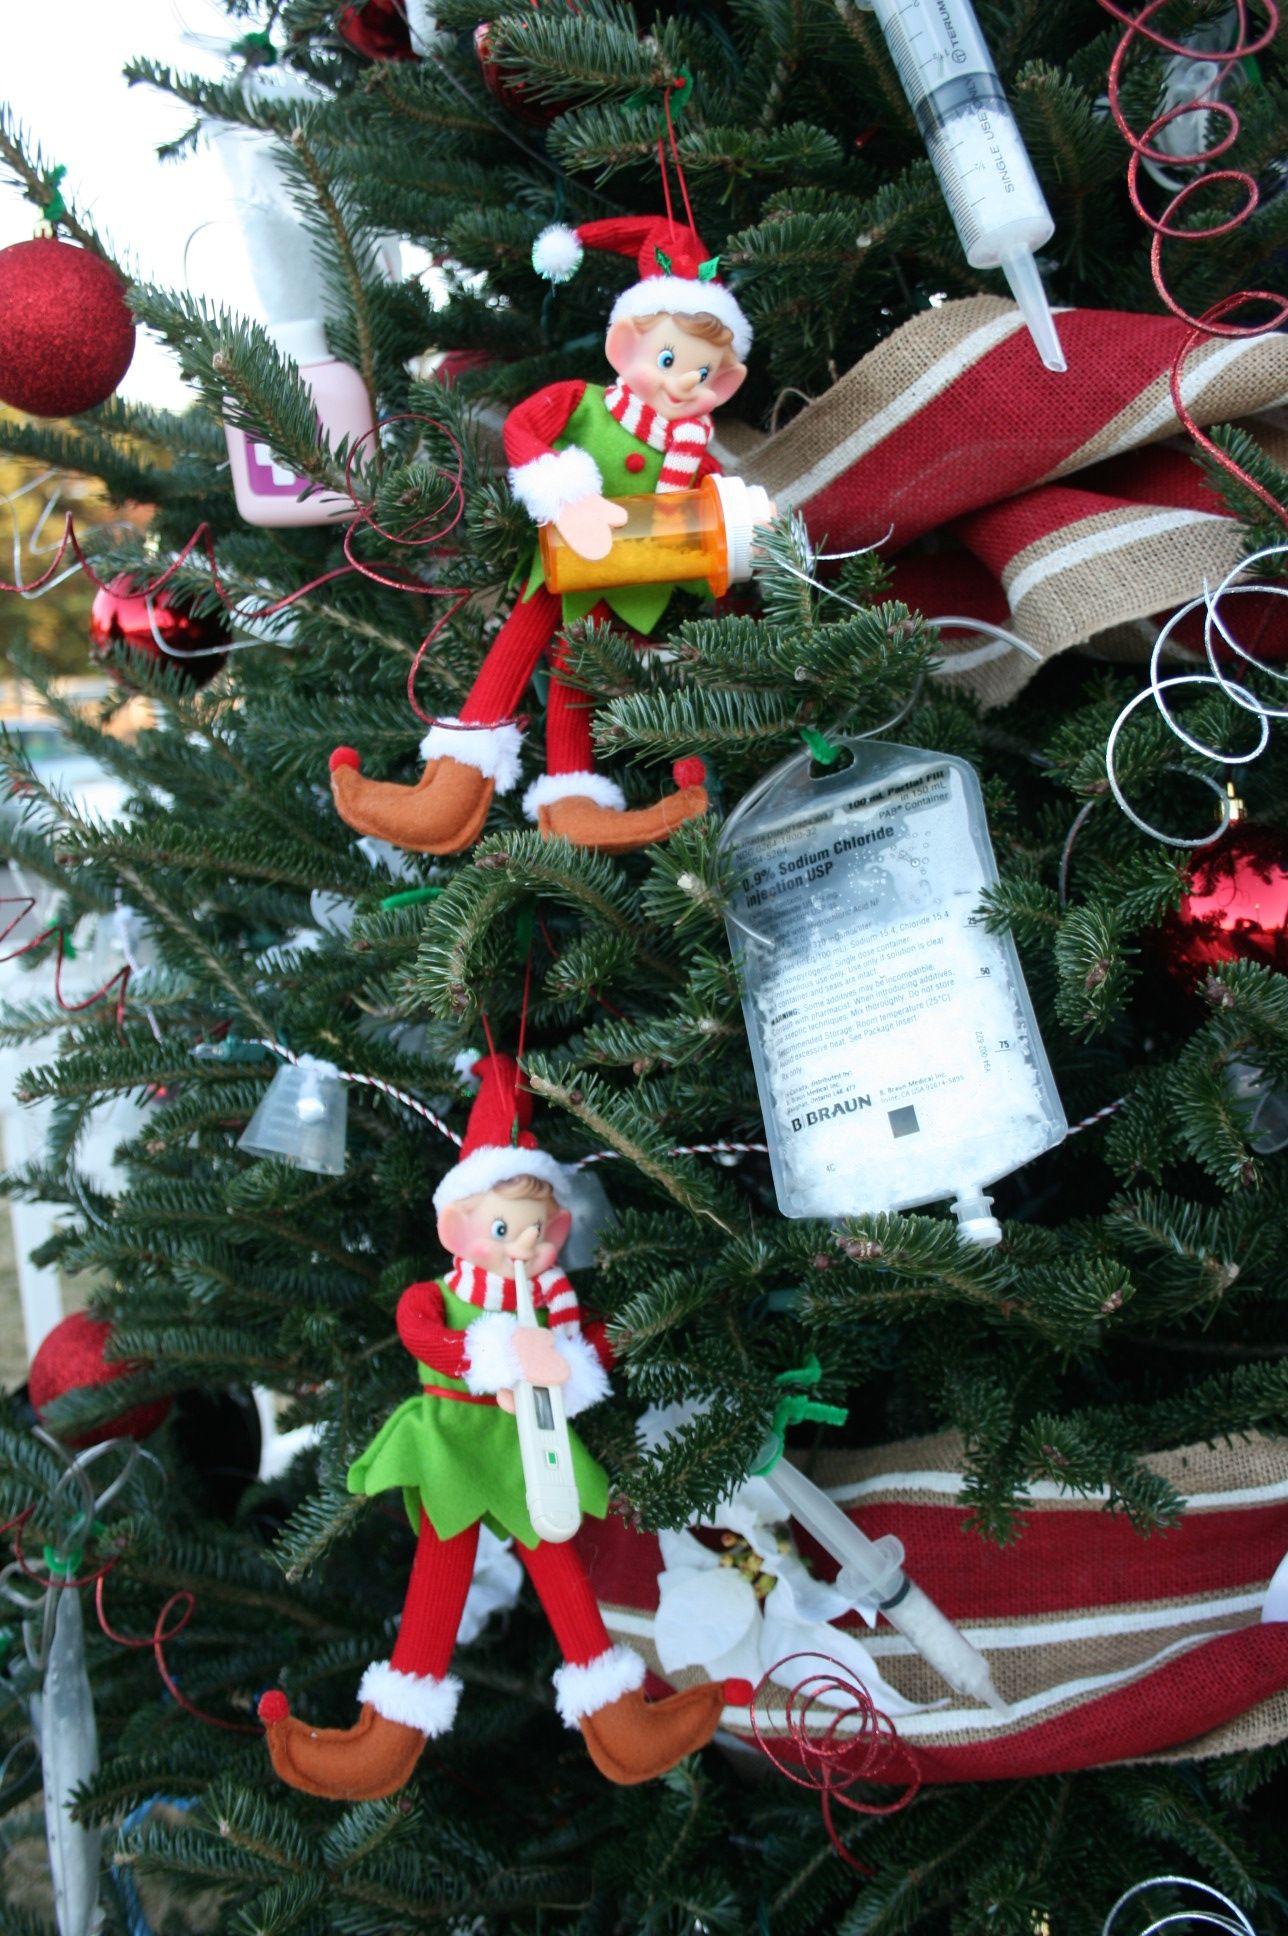 Nurse Christmas Tree use medical supplies to decorate